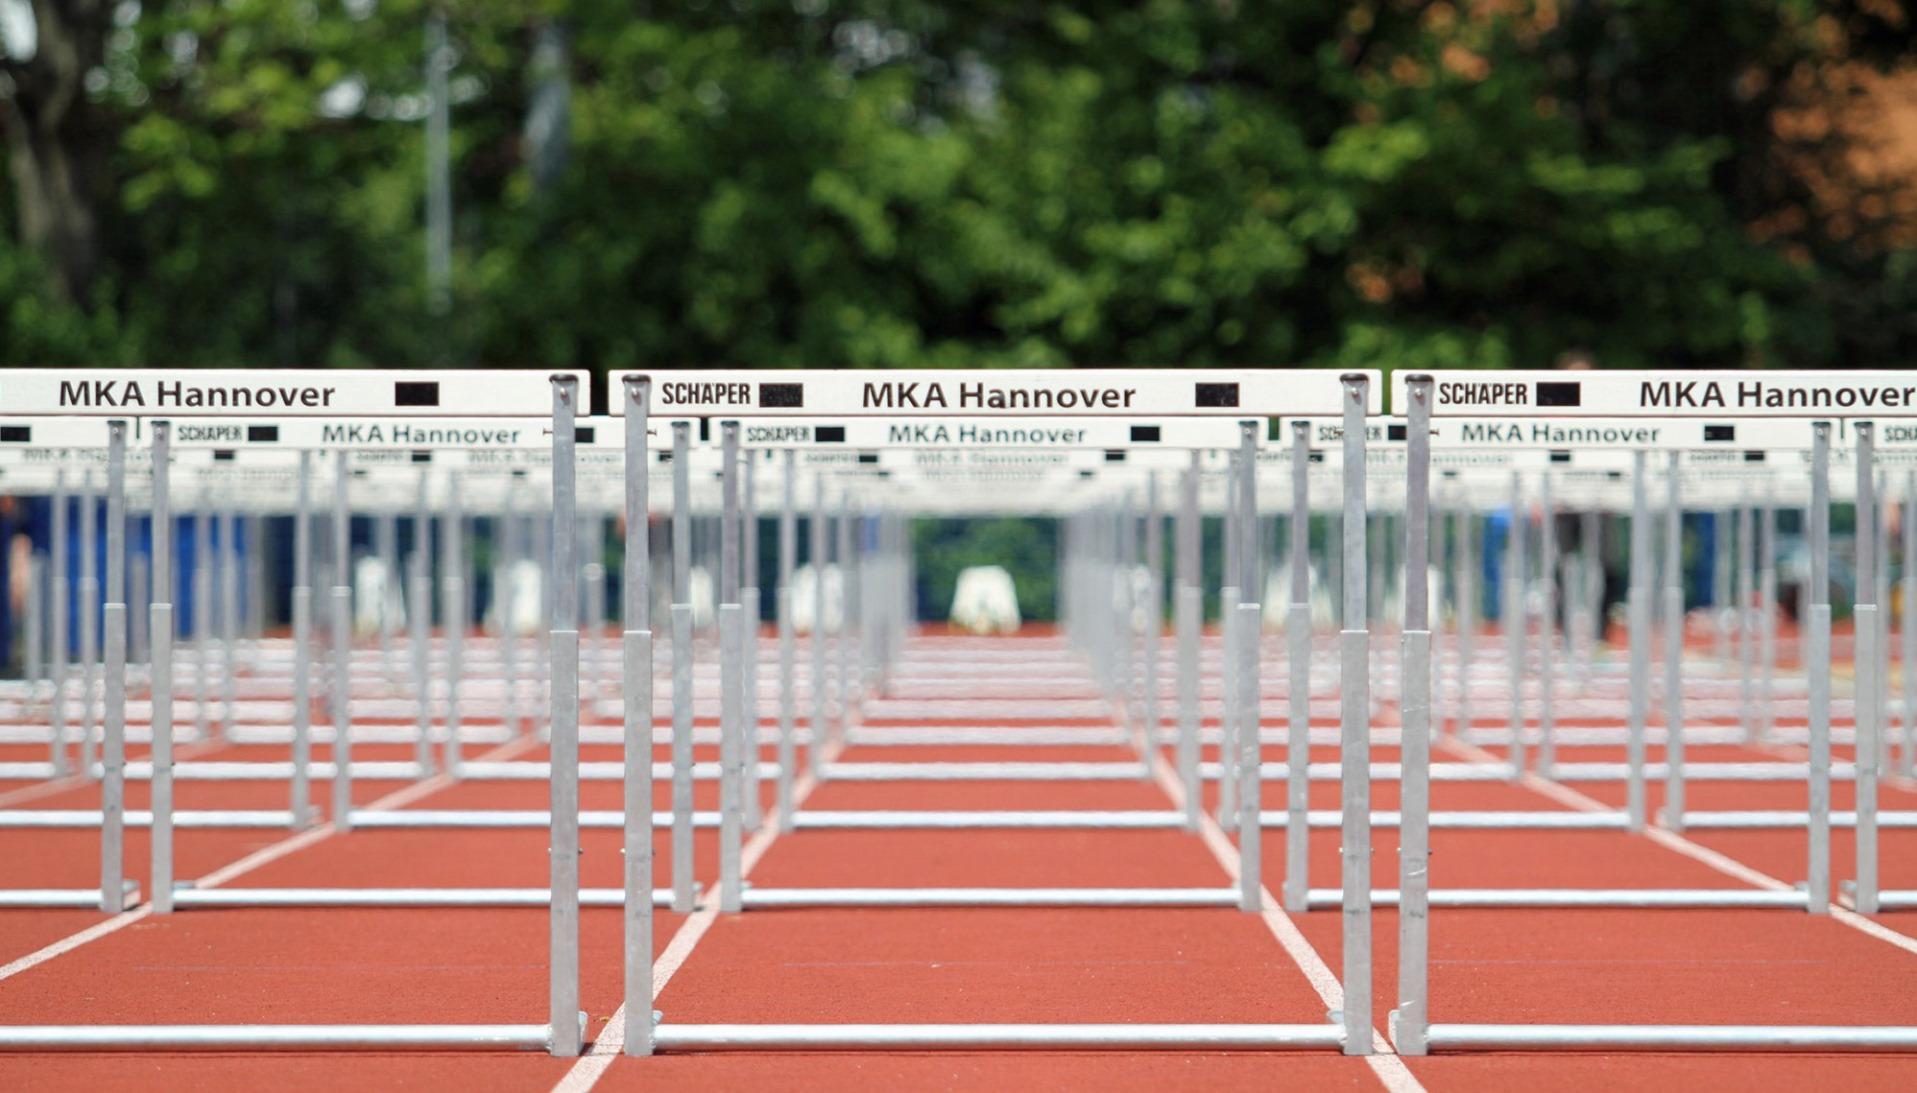 Hannover 96 Leichtathletik